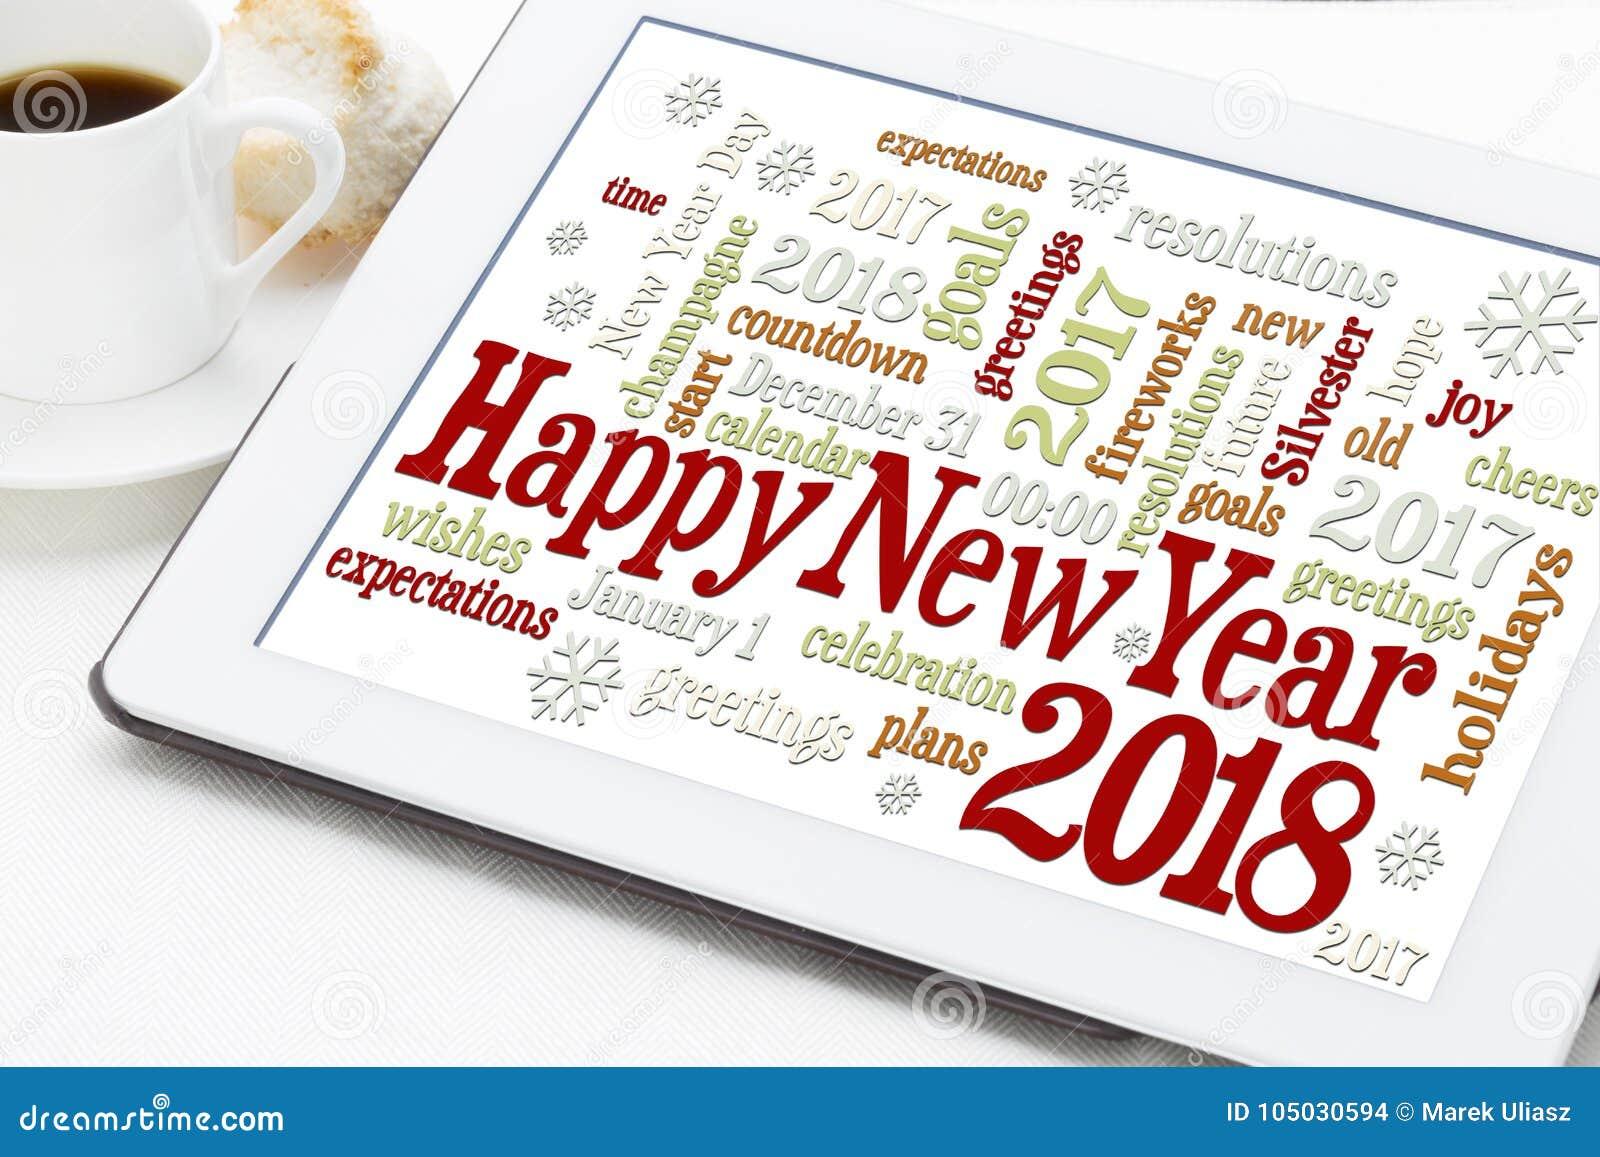 Happy New Year 2018 Word Cloud Stock Photo - Image of card, season ...